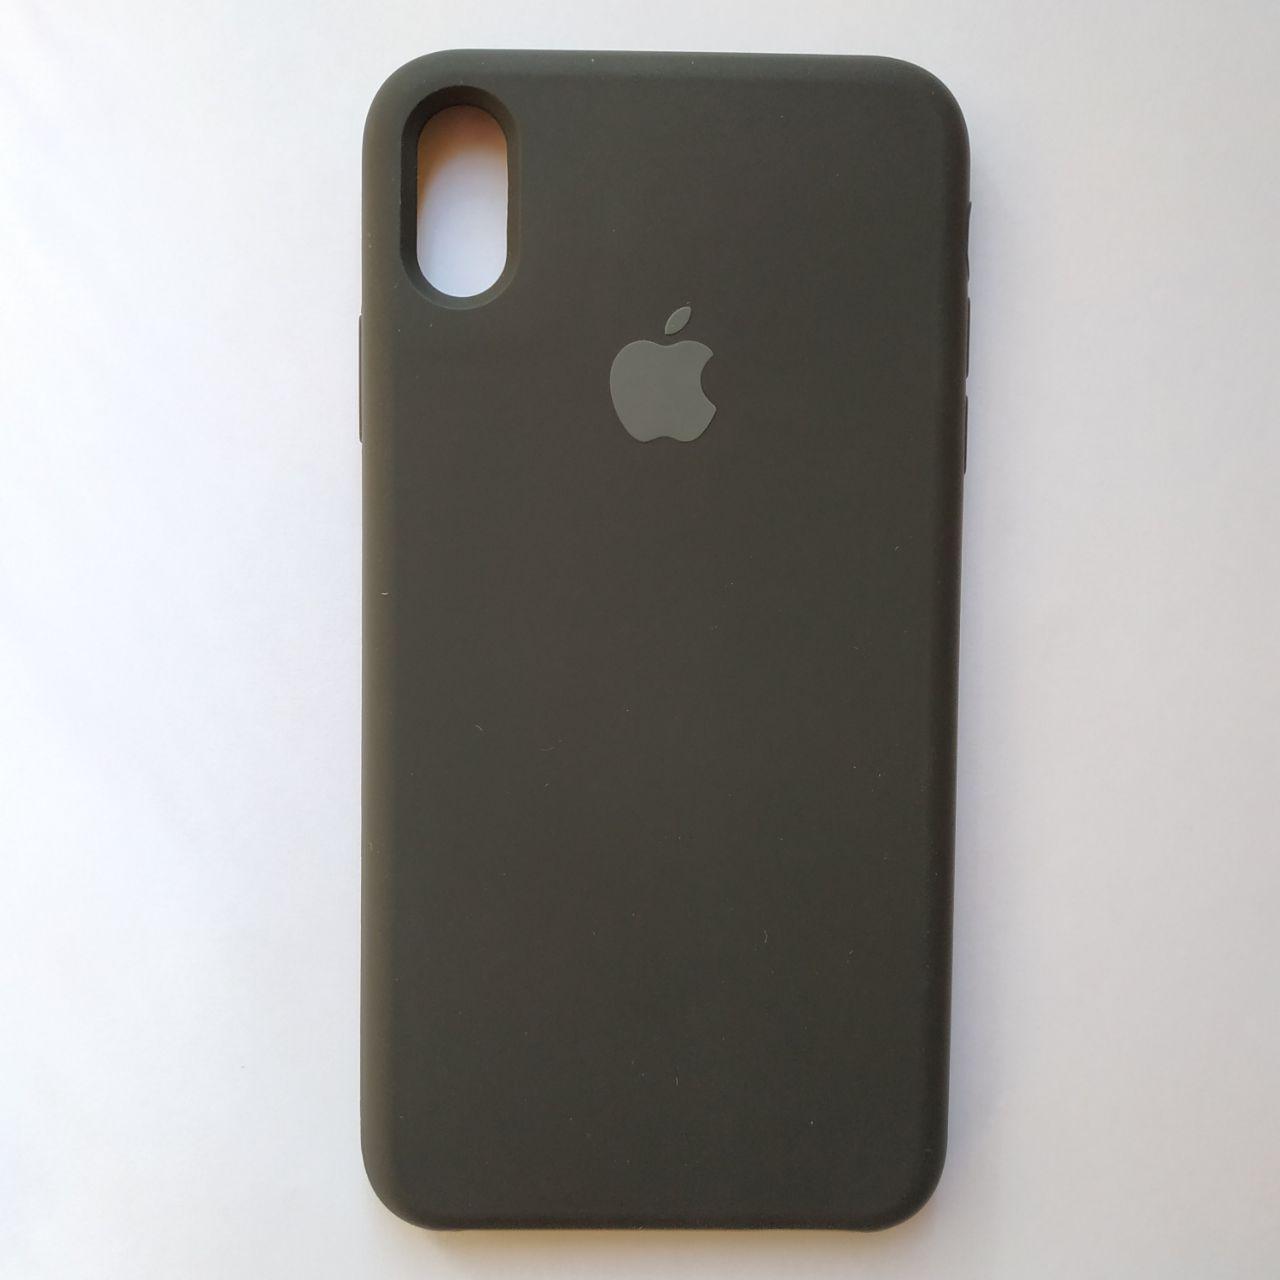 Чехол Silicone Case для Apple iPhone XS Max Black